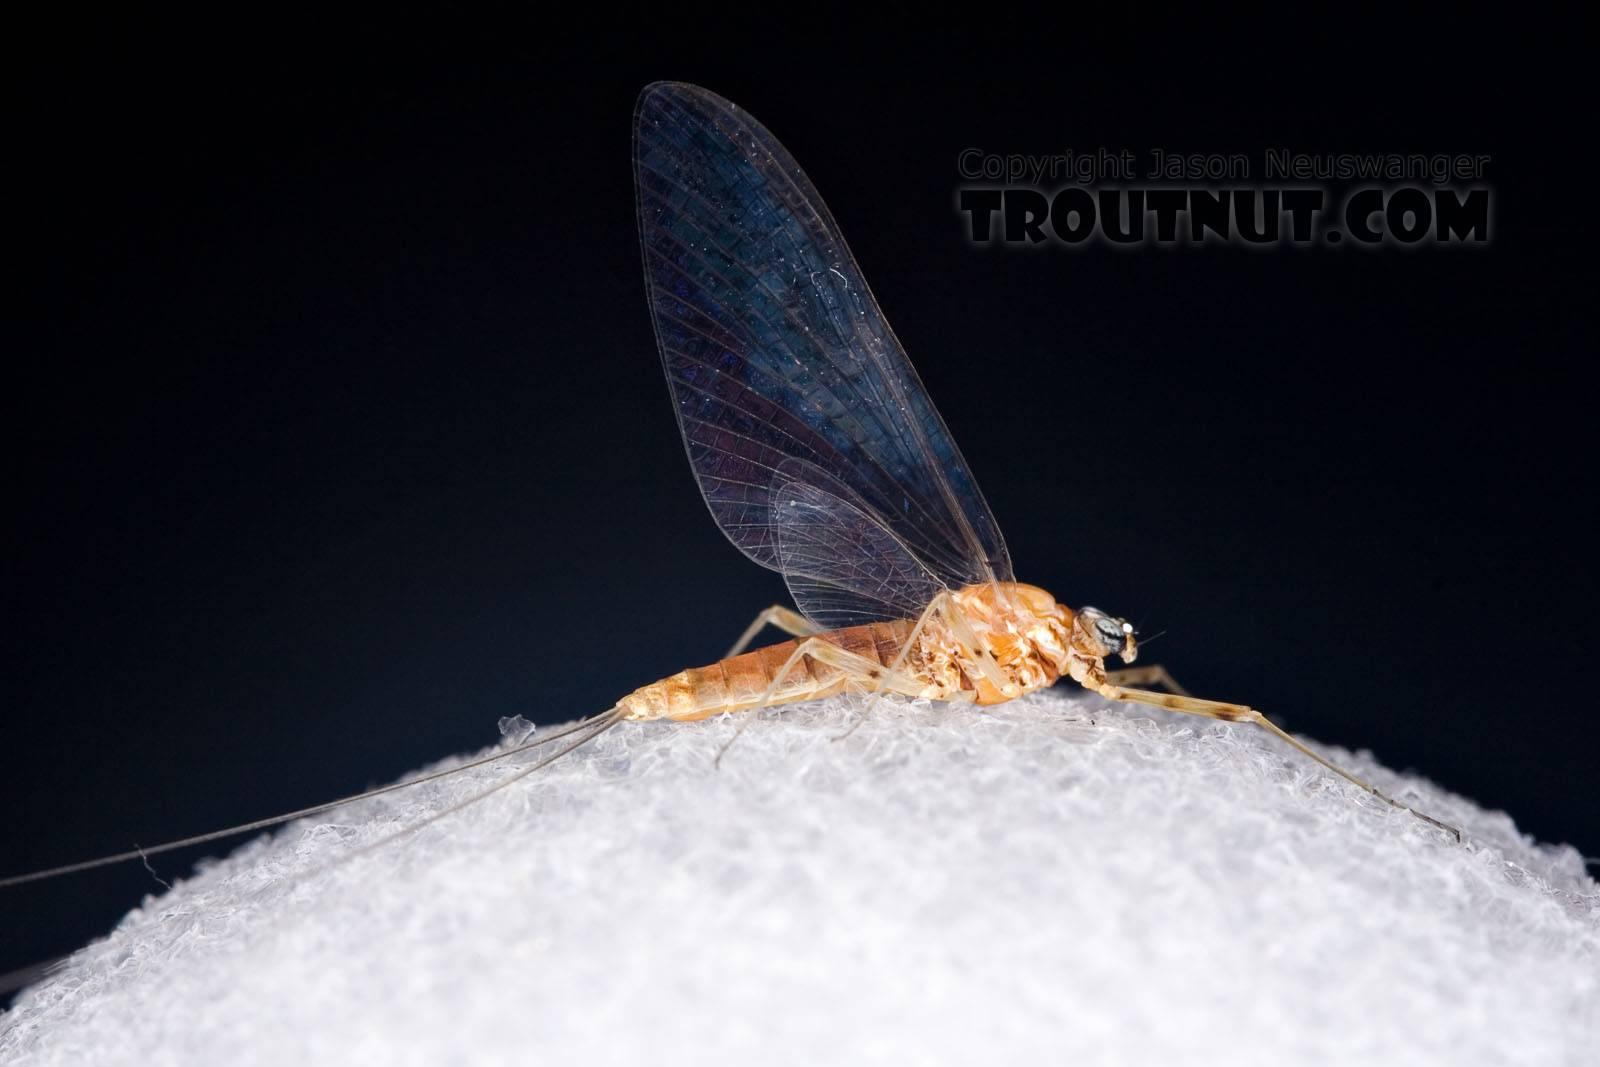 Female Epeorus vitreus (Sulphur) Mayfly Spinner from Mystery Creek #42 in Pennsylvania